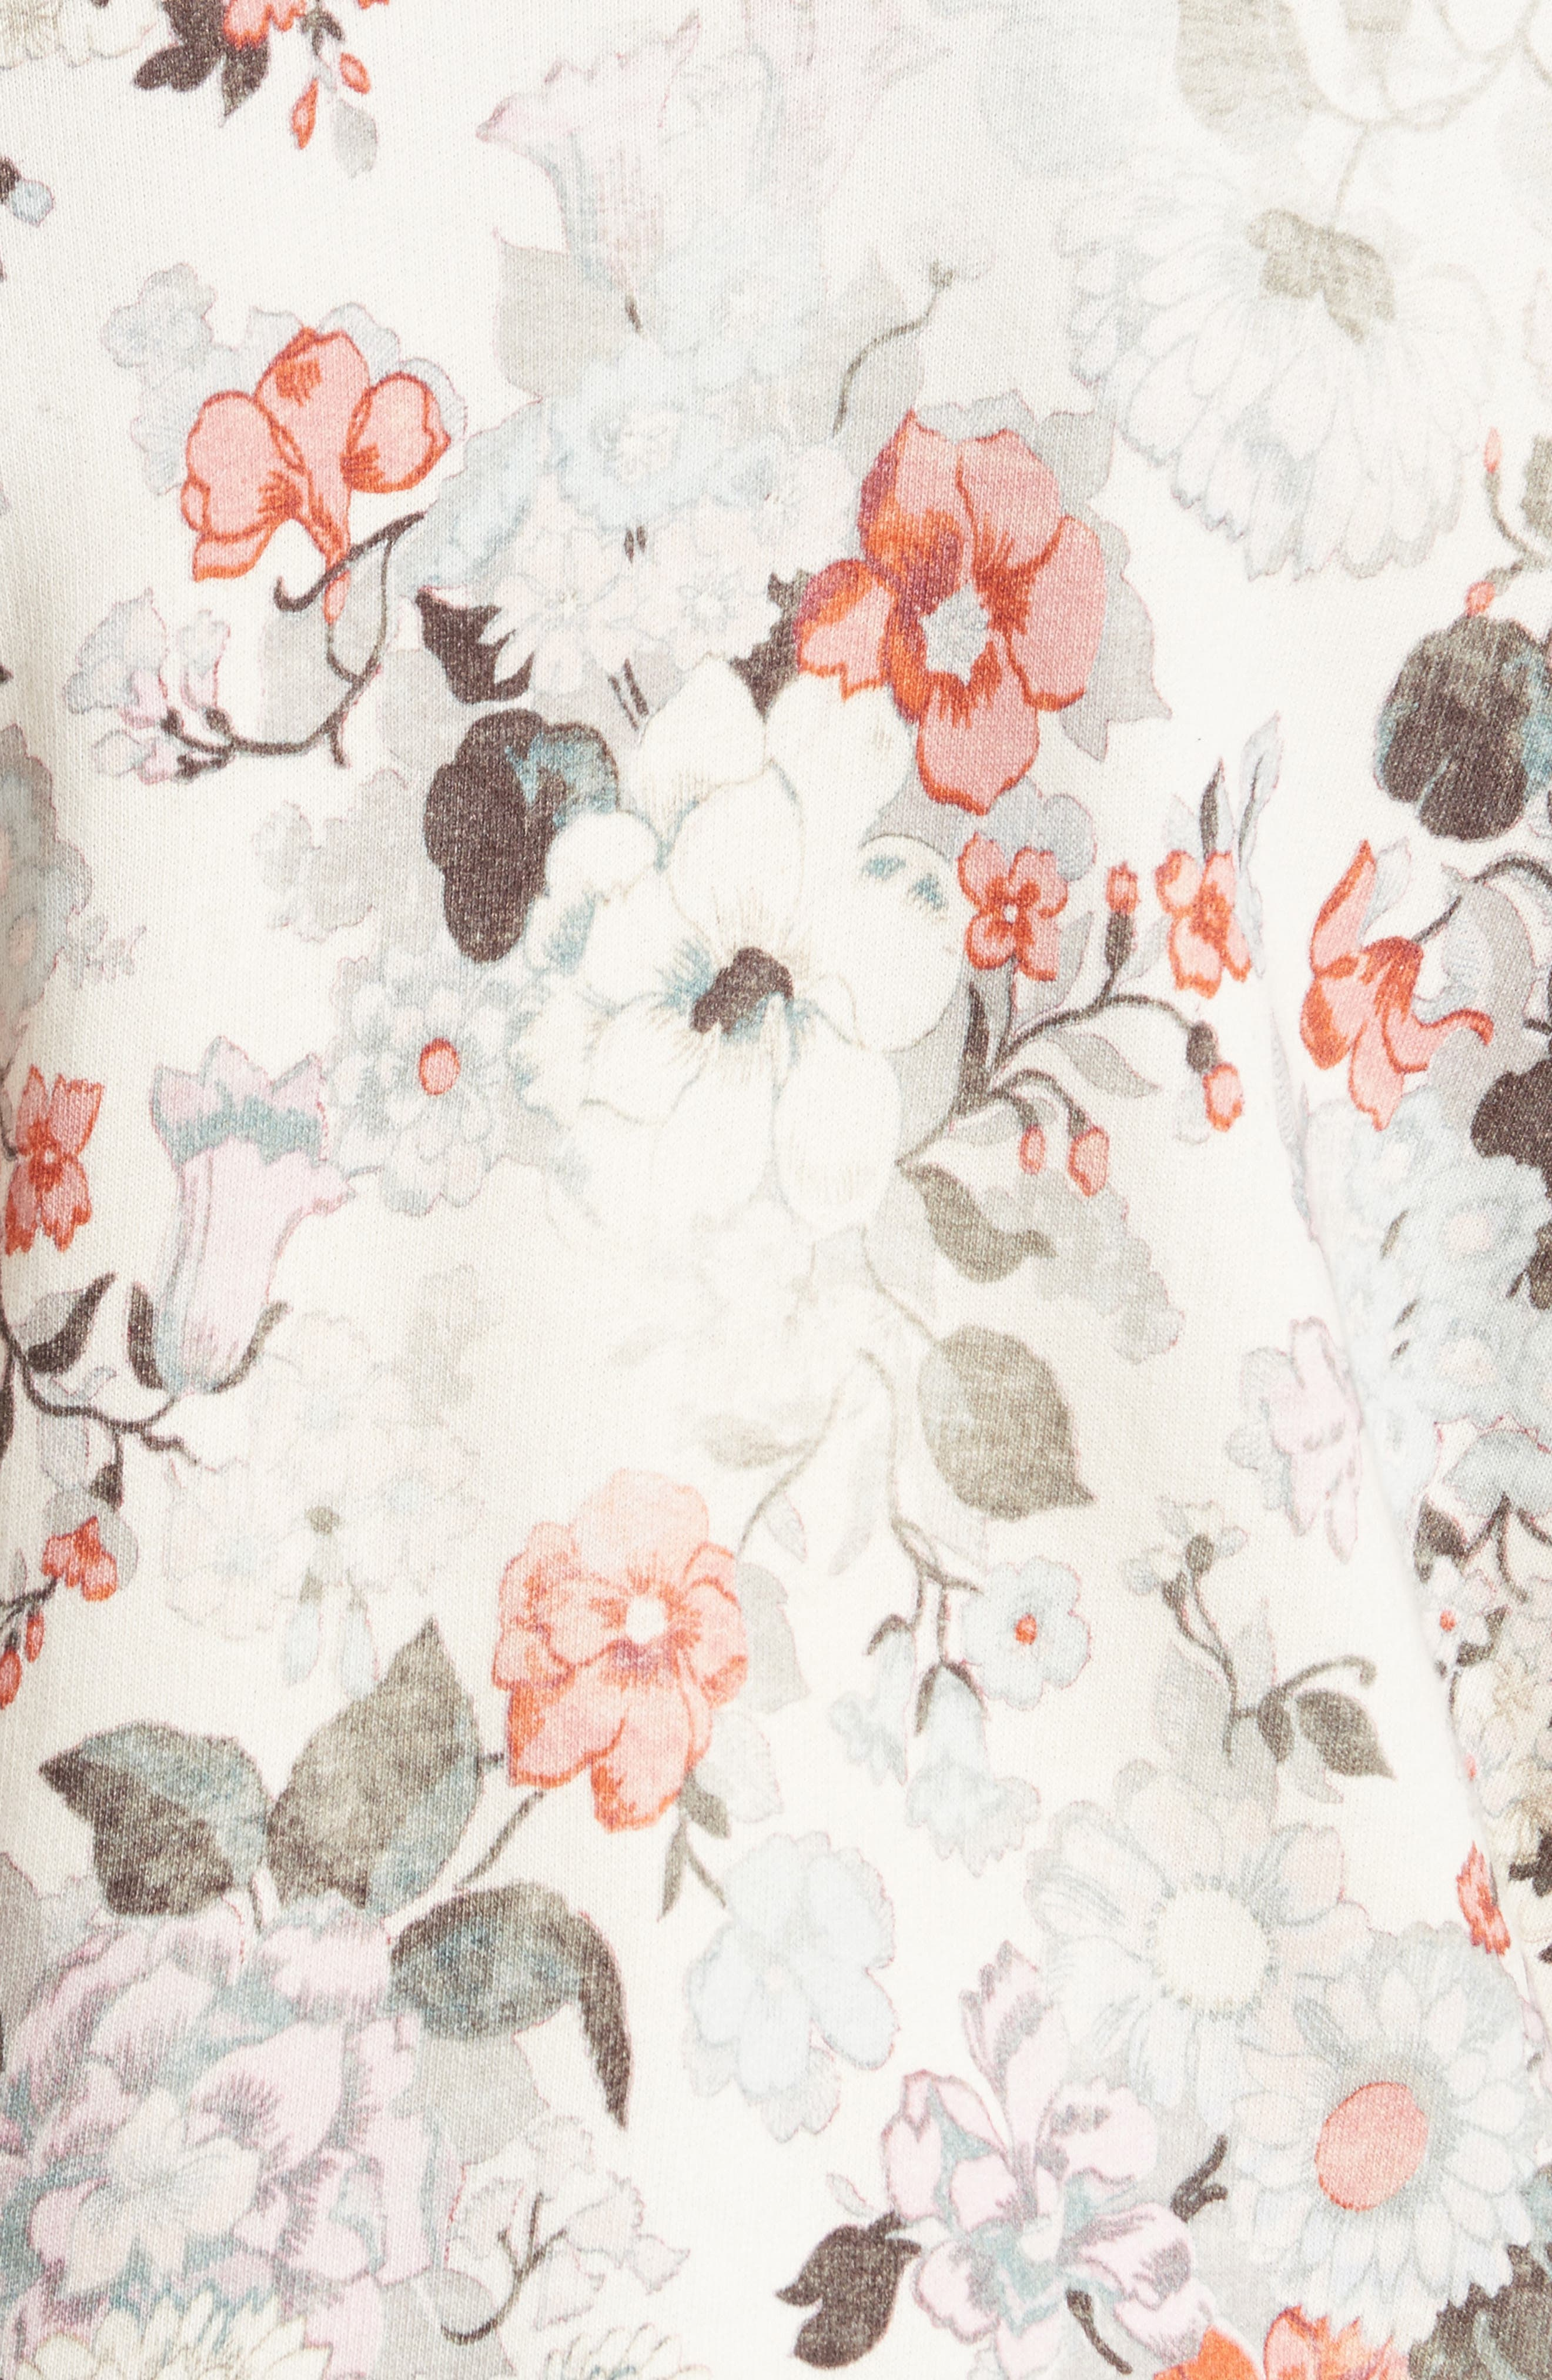 Lua Ruffle Pullover,                             Alternate thumbnail 5, color,                             Cream Combo